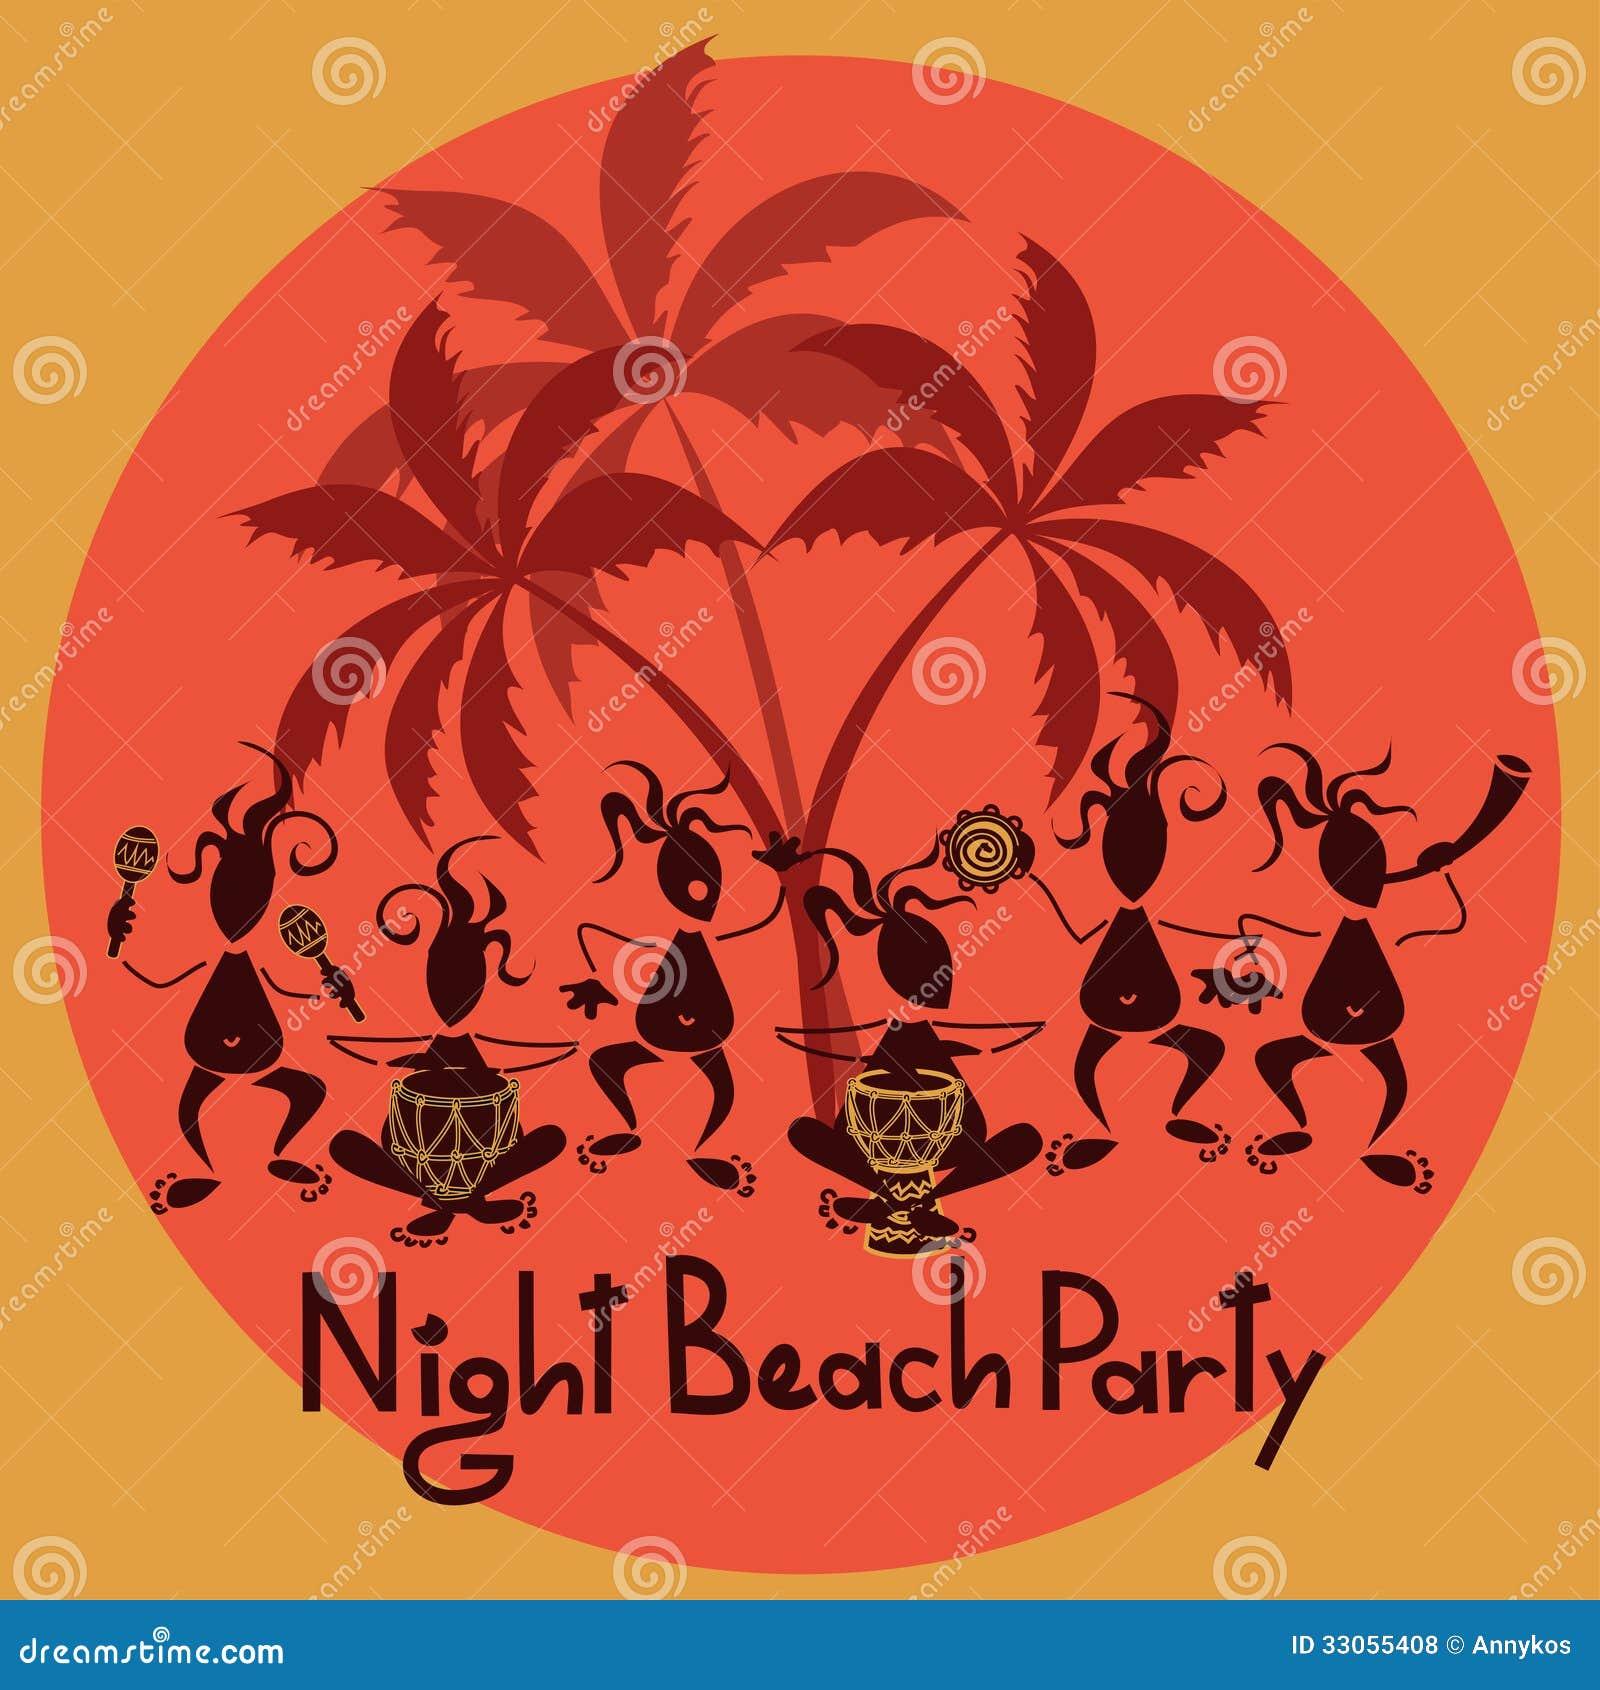 funny invitation to night beach party stock vector